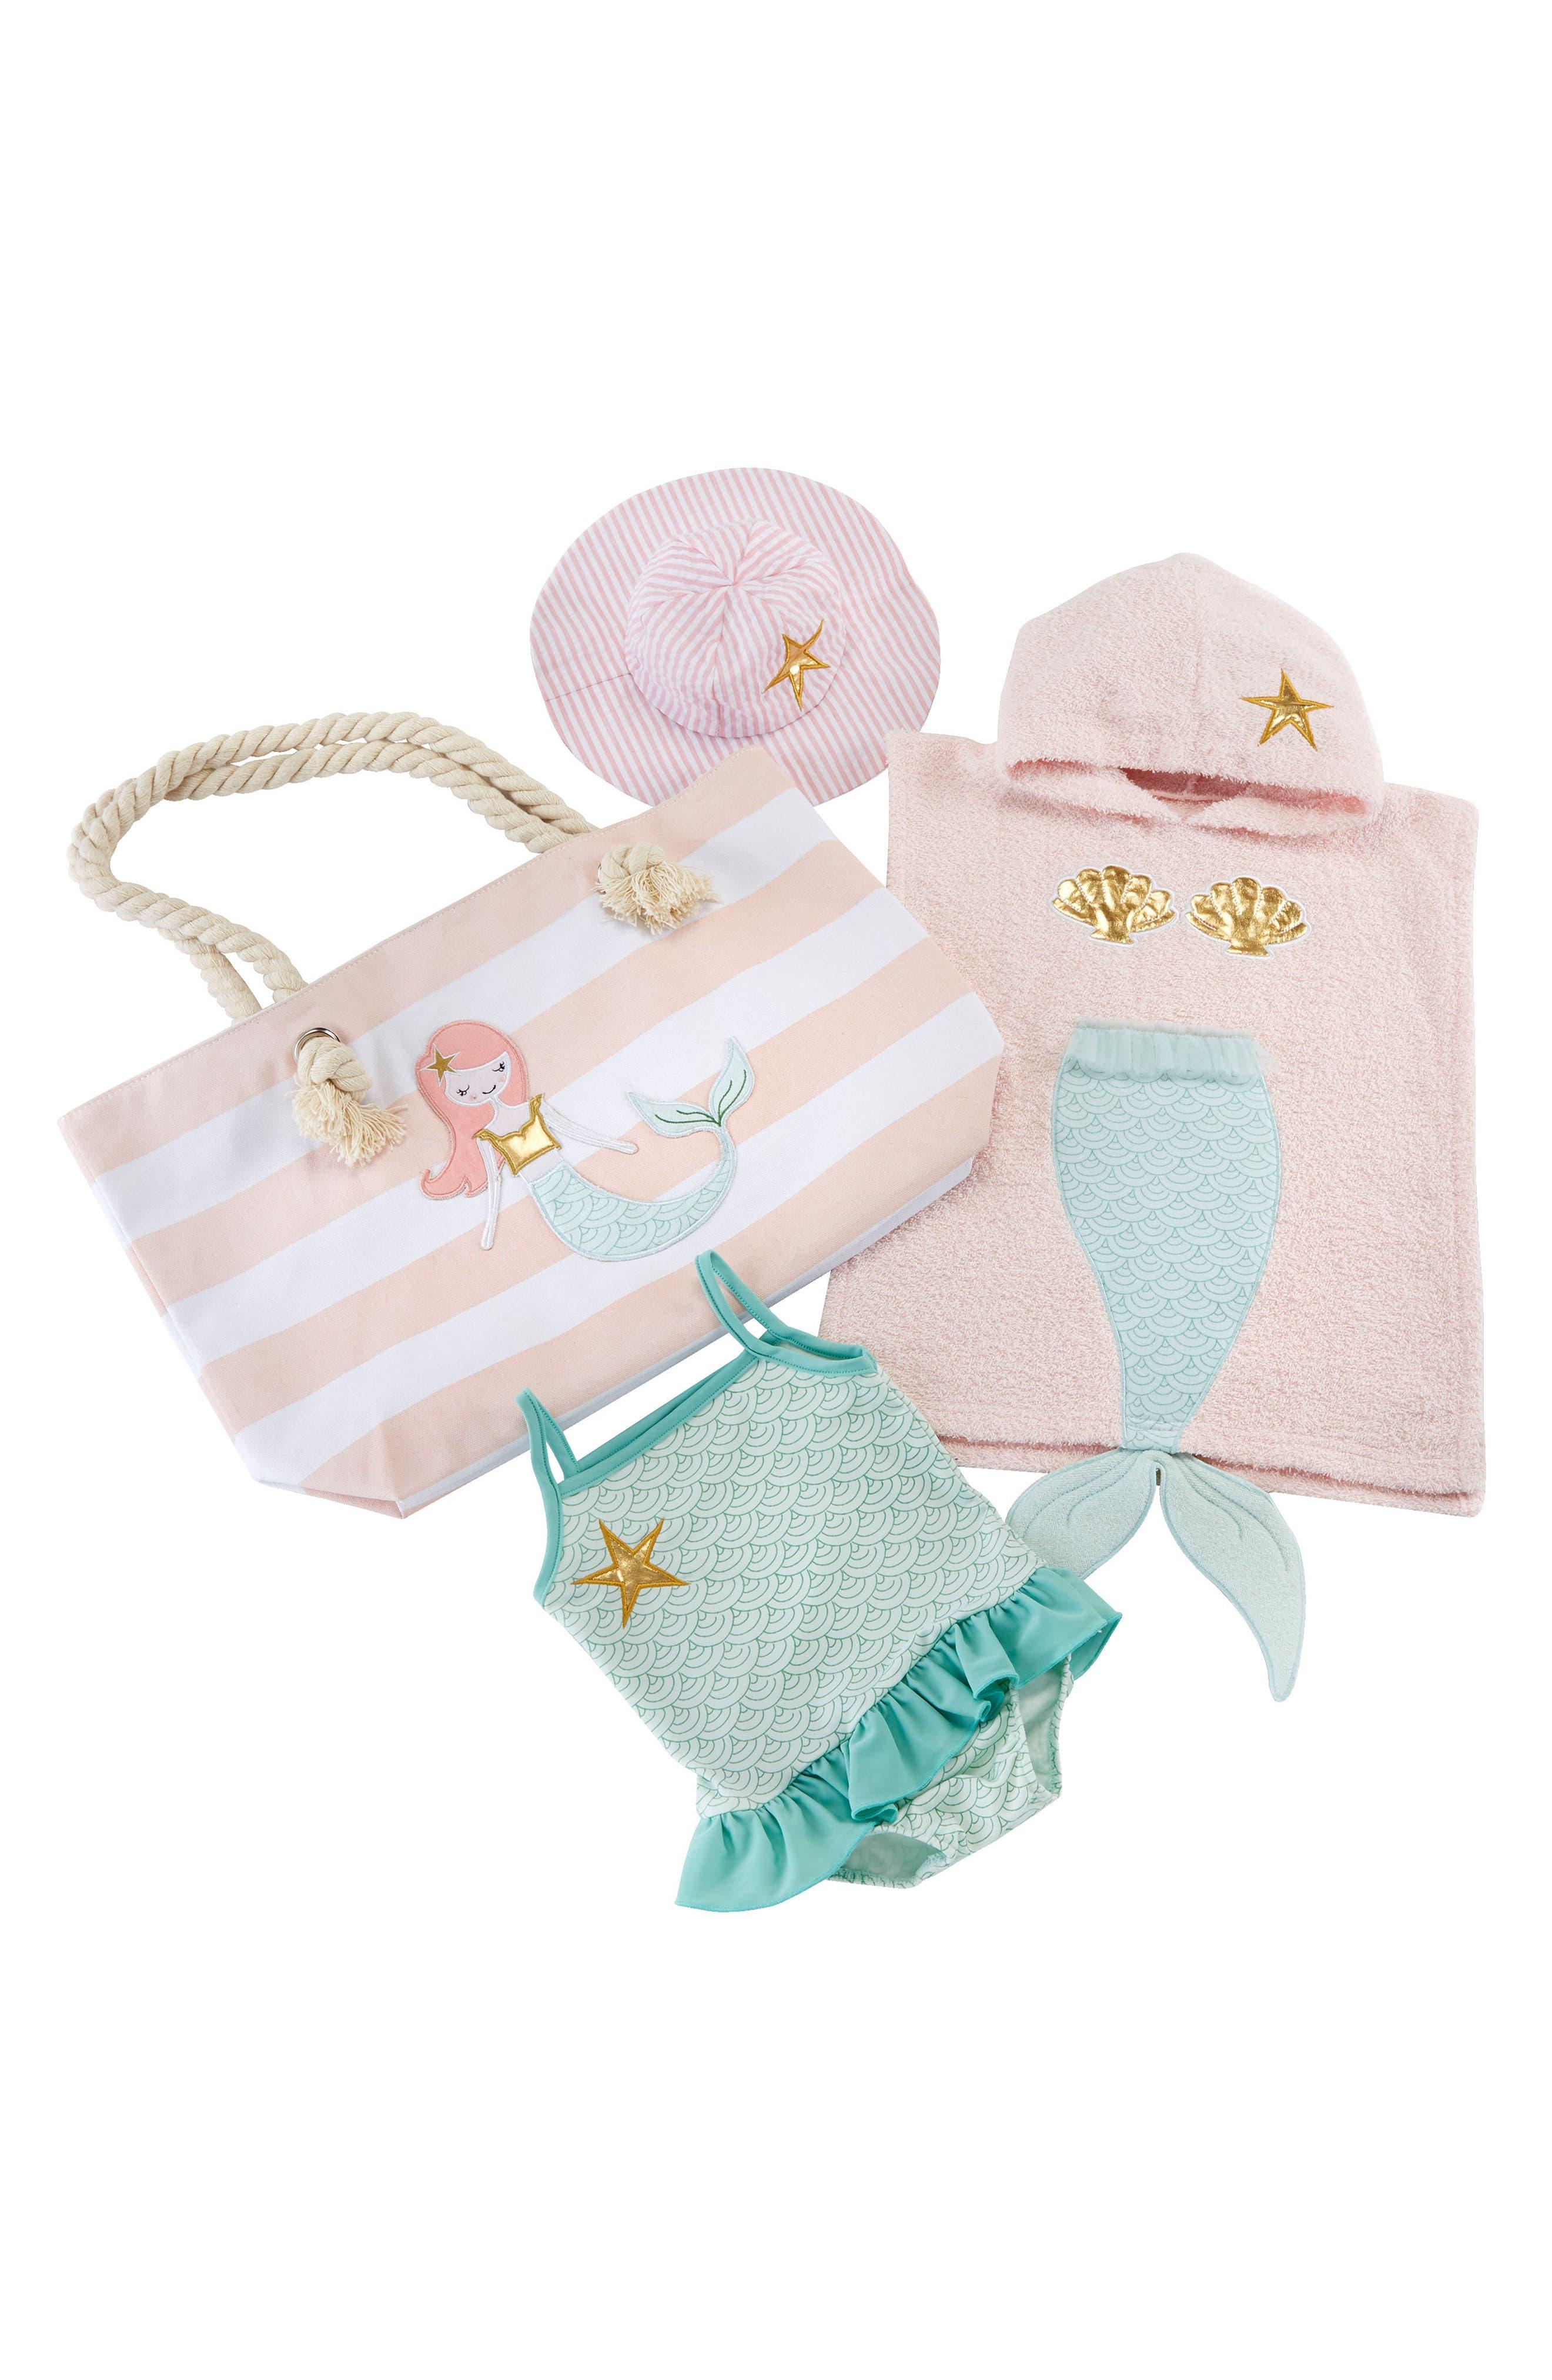 Mermaid Hooded Towel, Swimsuit, Sun Hat & Tote Set, Main, color, PINK